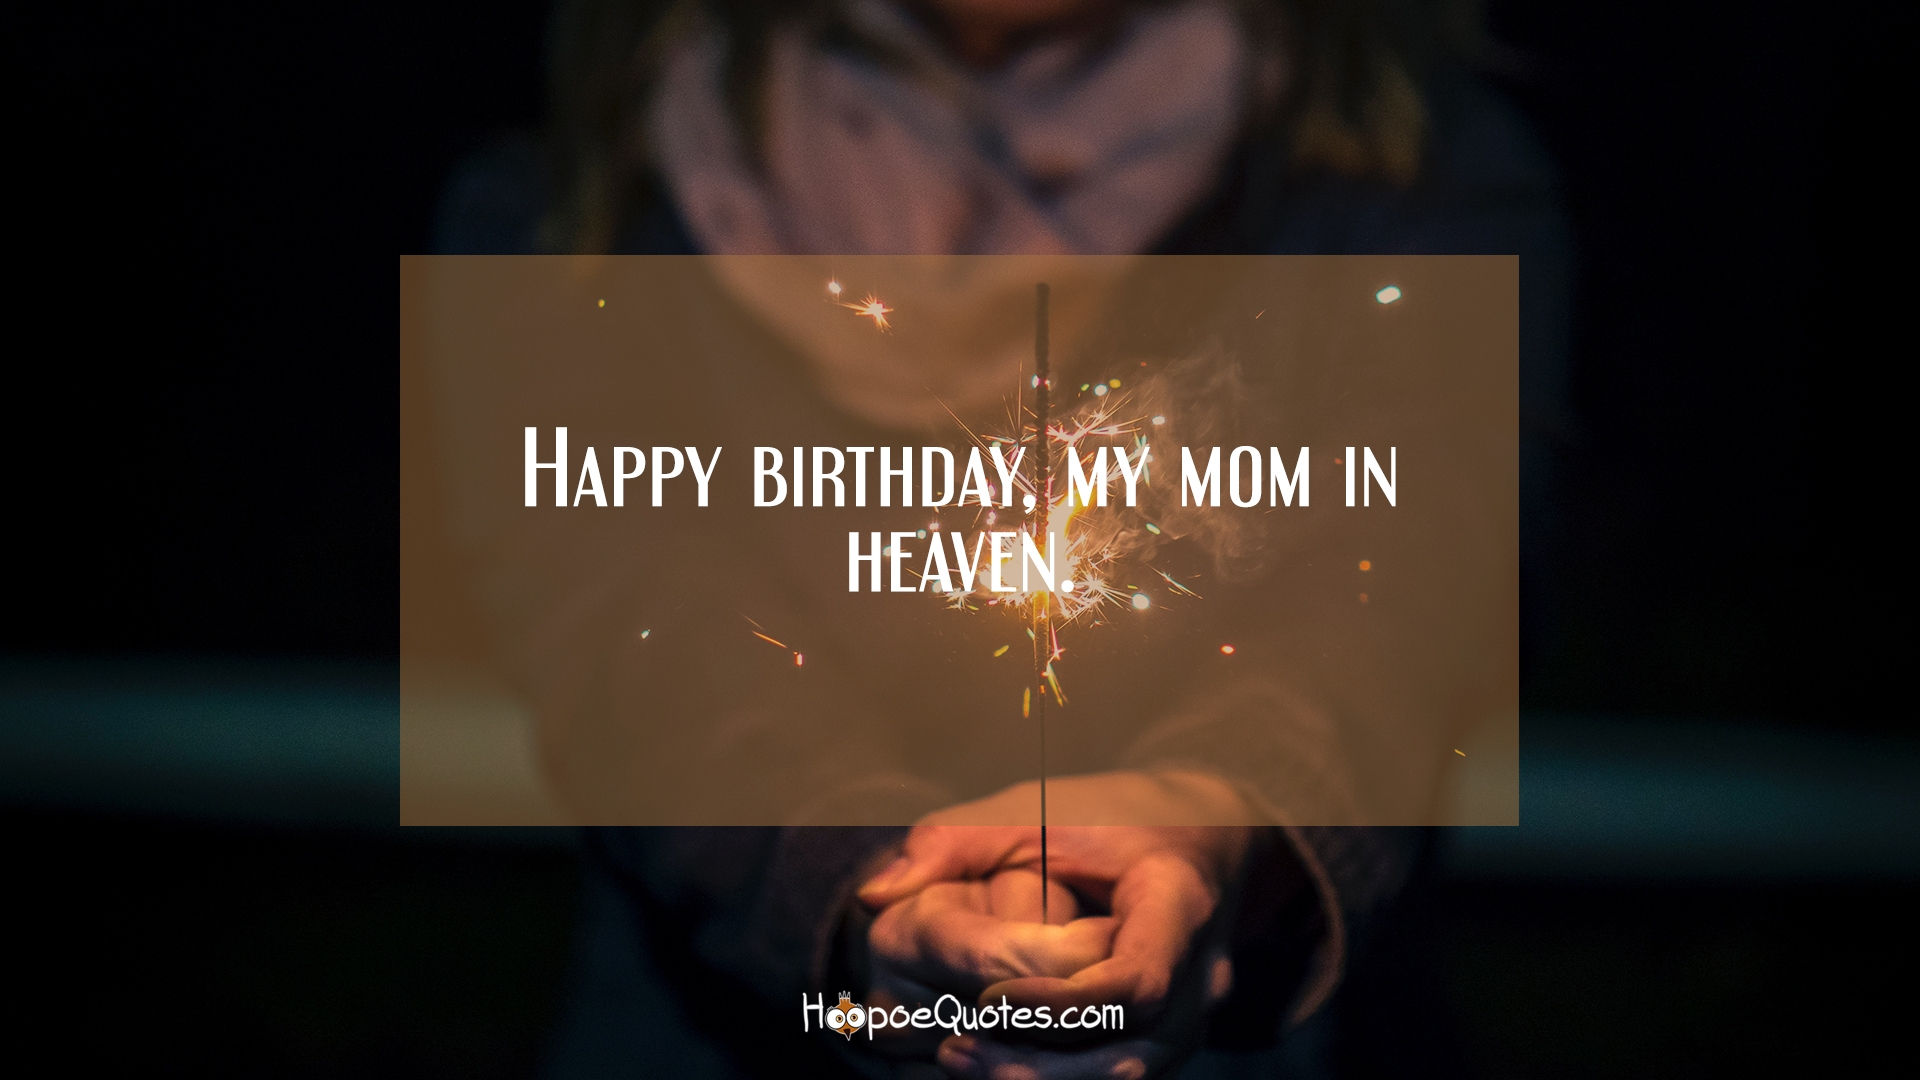 Happy Birthday My Mom In Heaven Hoopoequotes